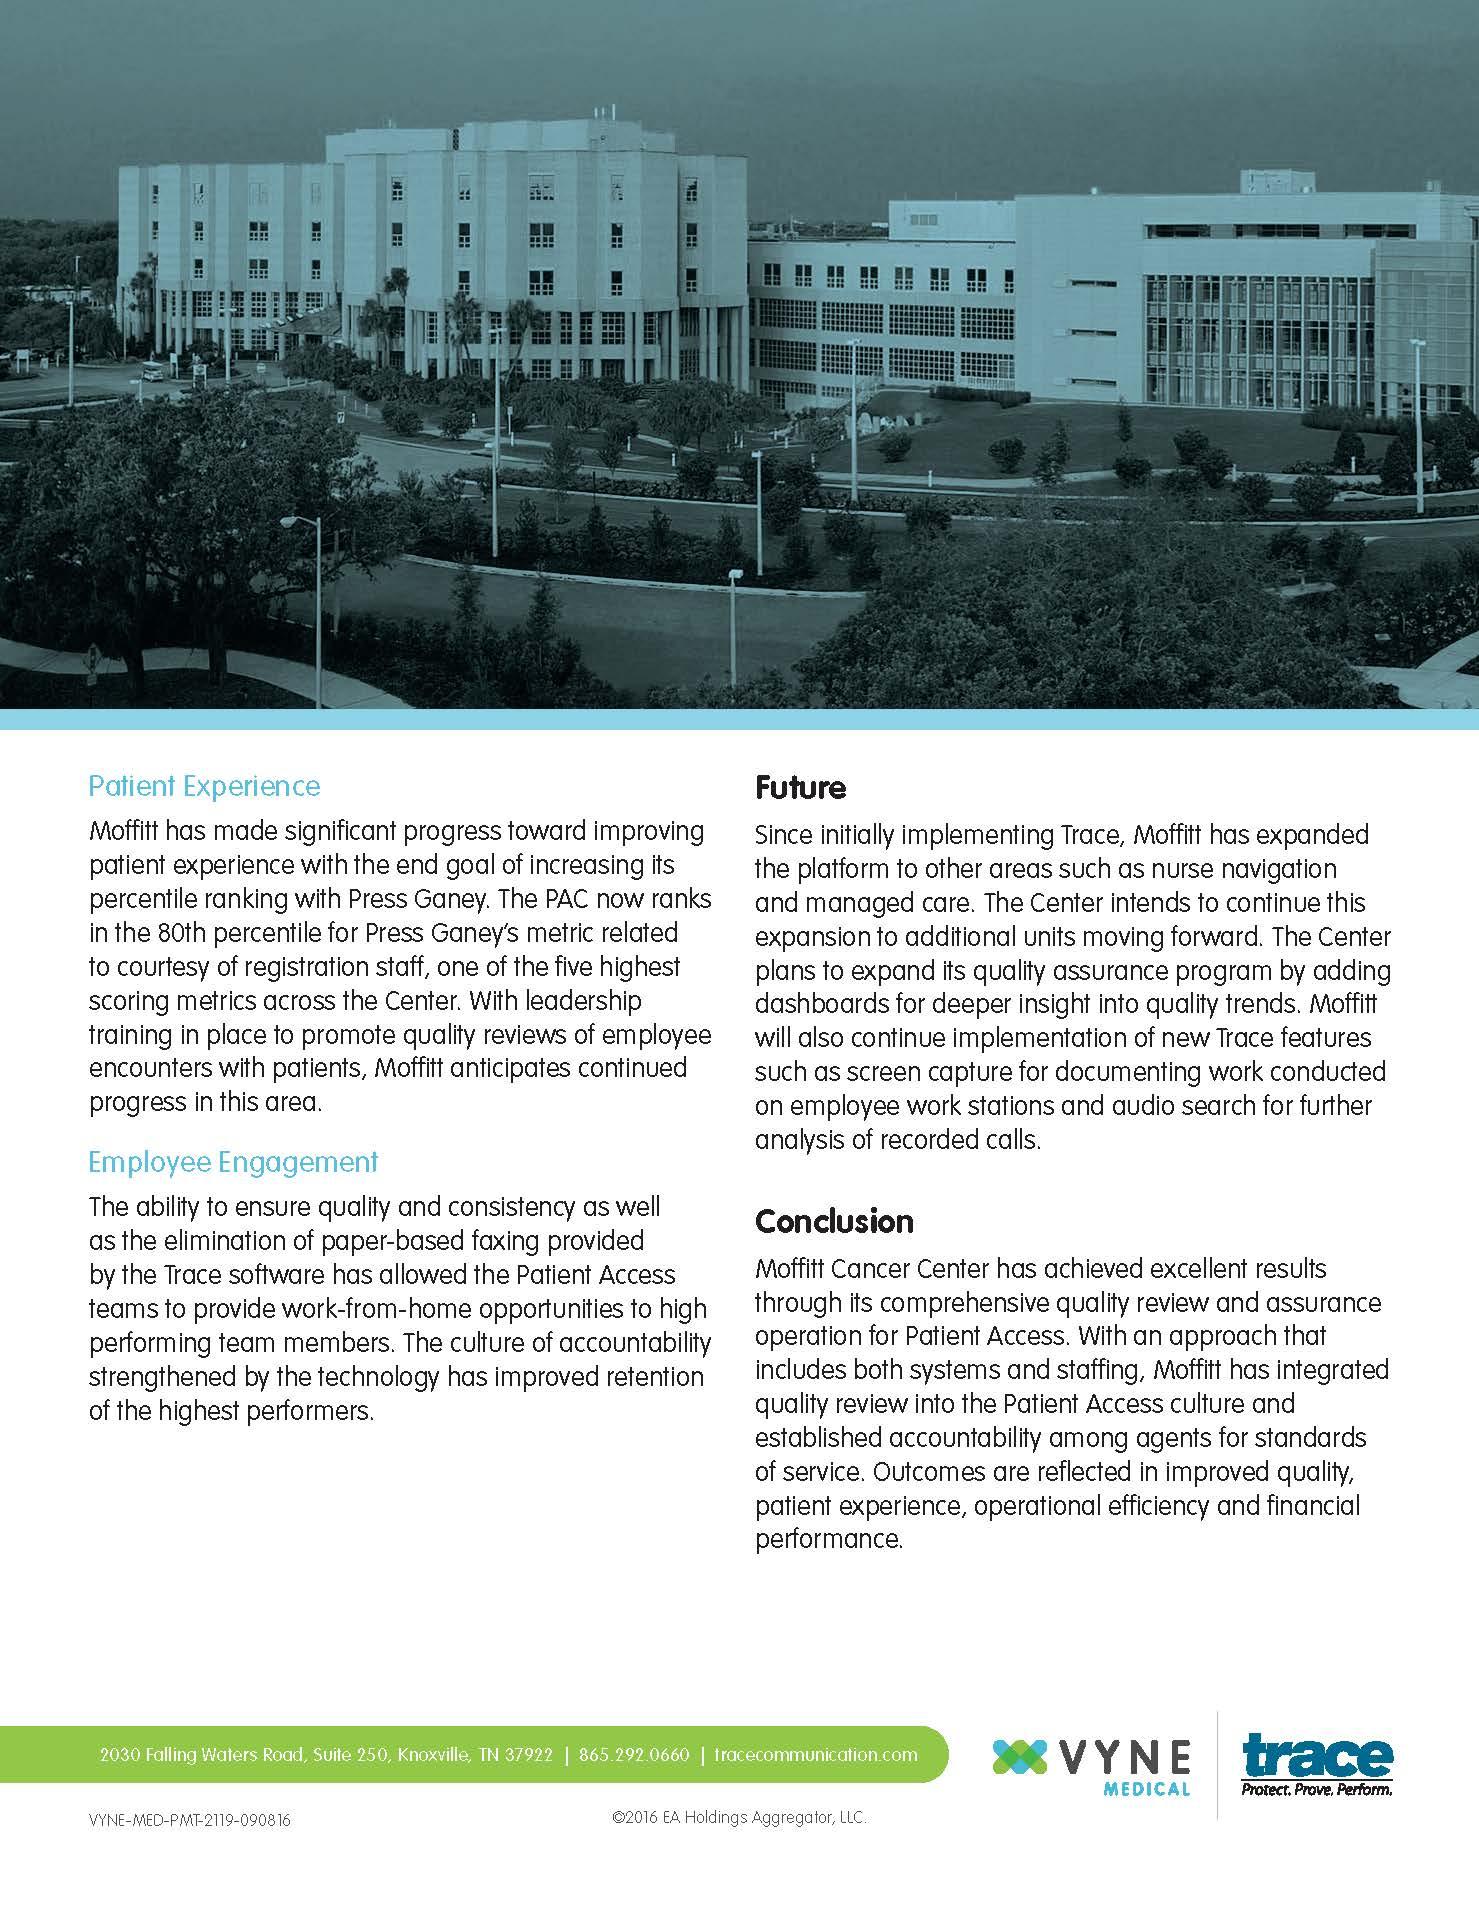 case-study-Moffitt-Cancer-Center_Page_4.jpg